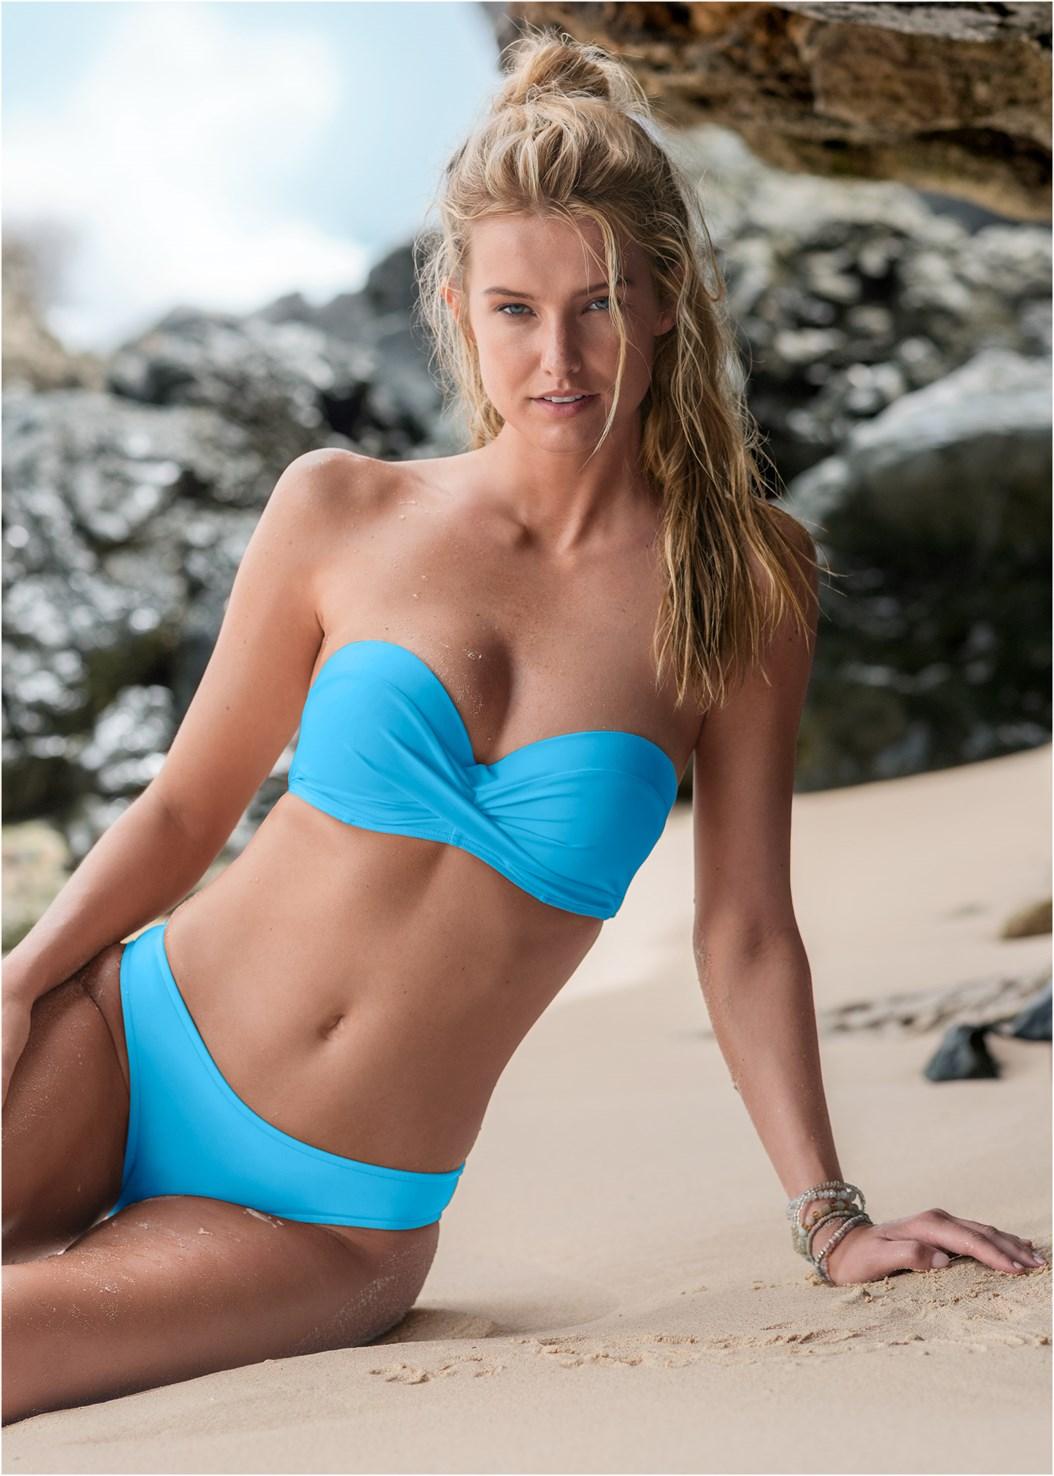 Scoop Front Classic Bikini Bottom ,Summer Breeze Bandeau,Strappy Bandeau Top